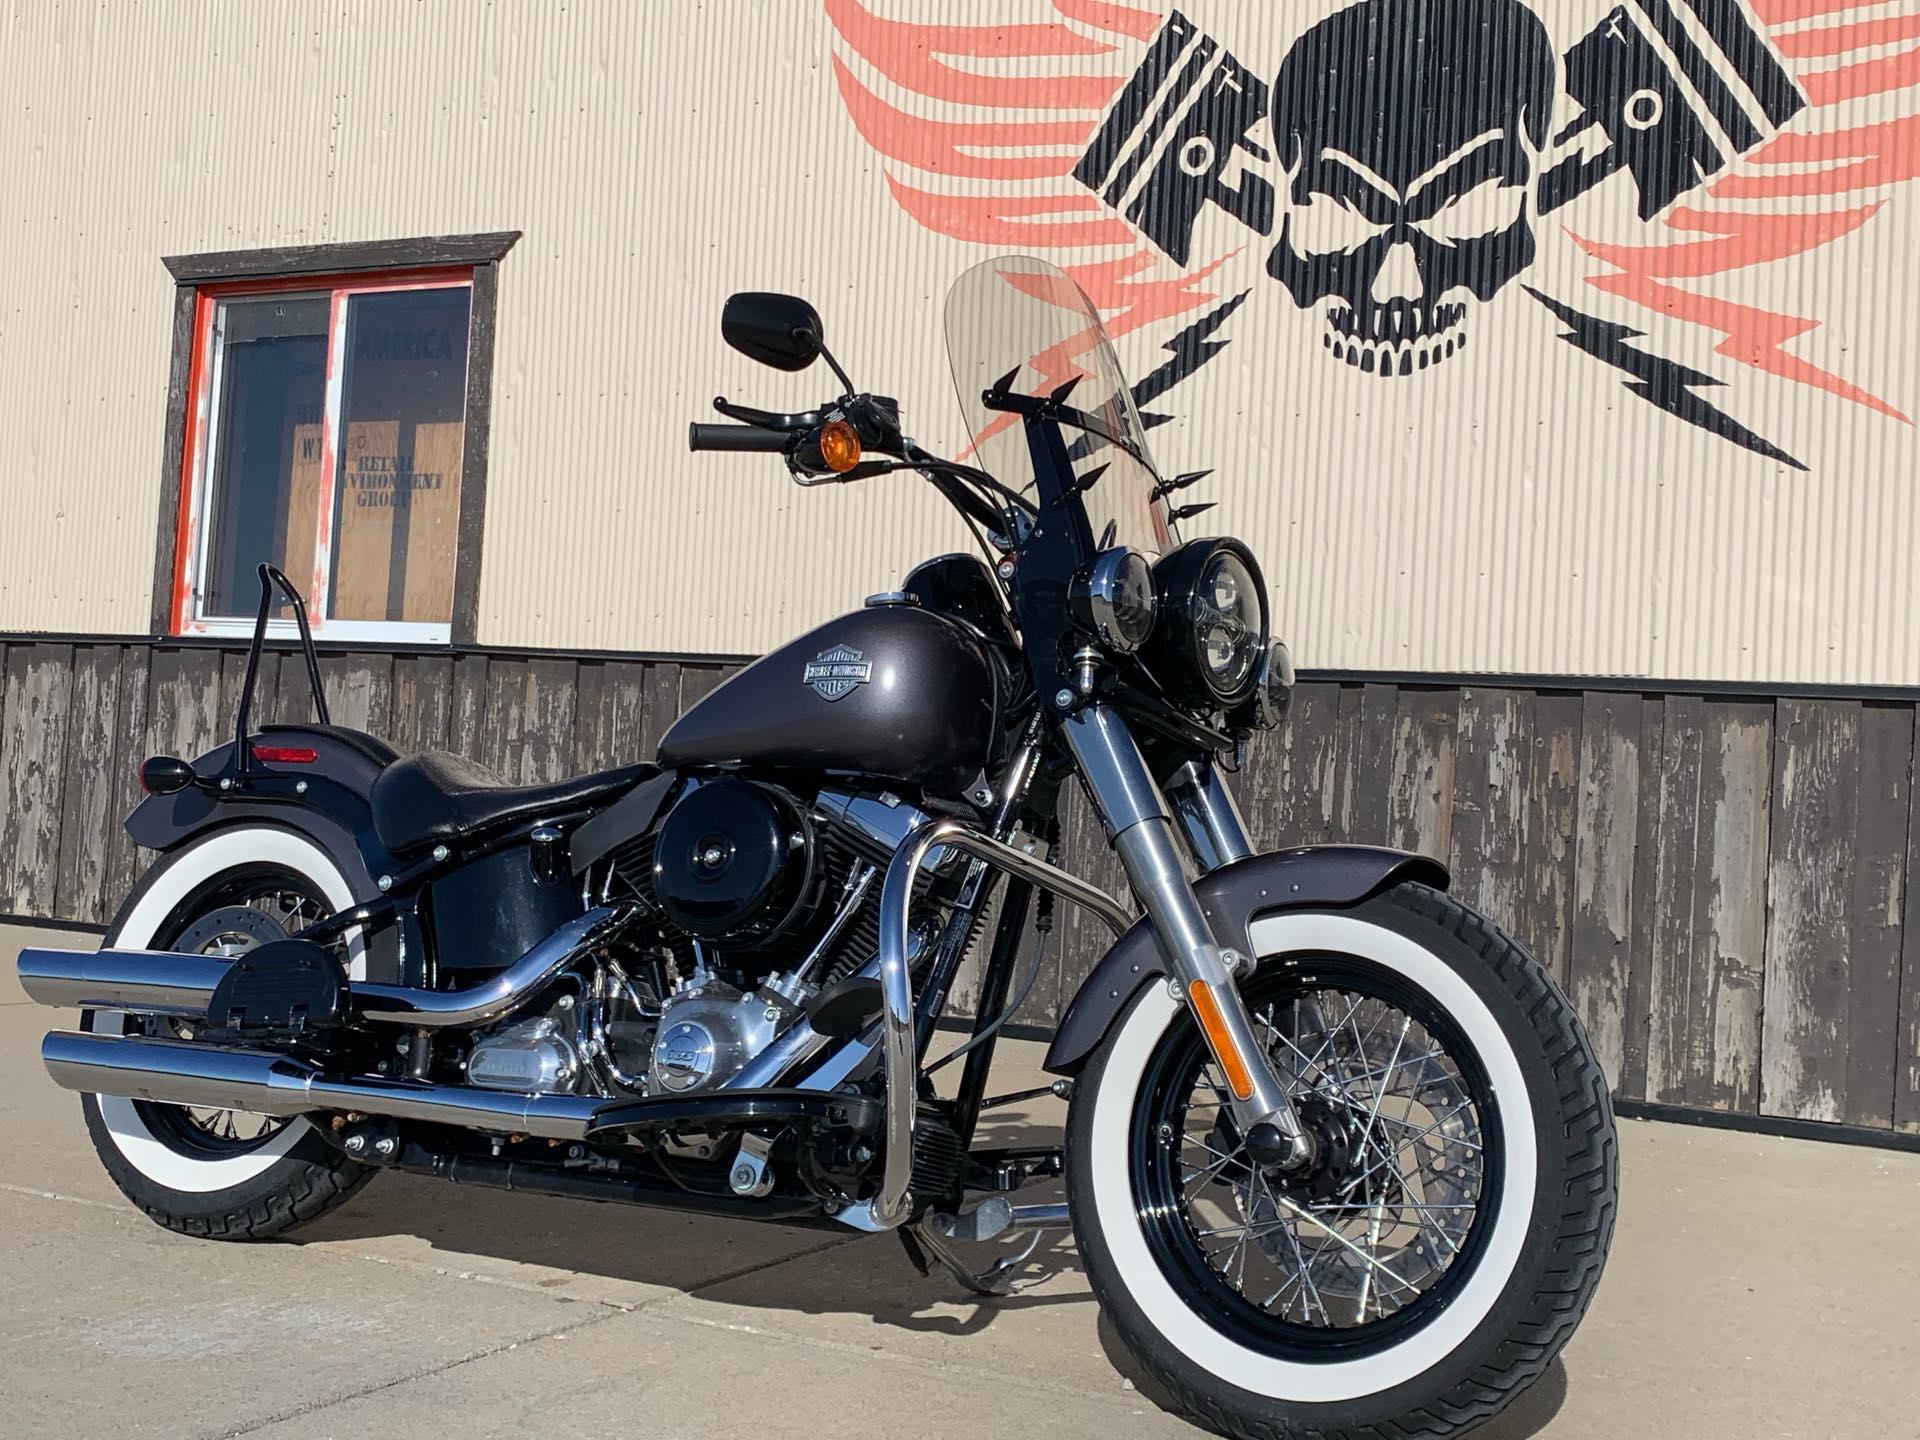 2015 Harley-Davidson Softail Slim at Loess Hills Harley-Davidson